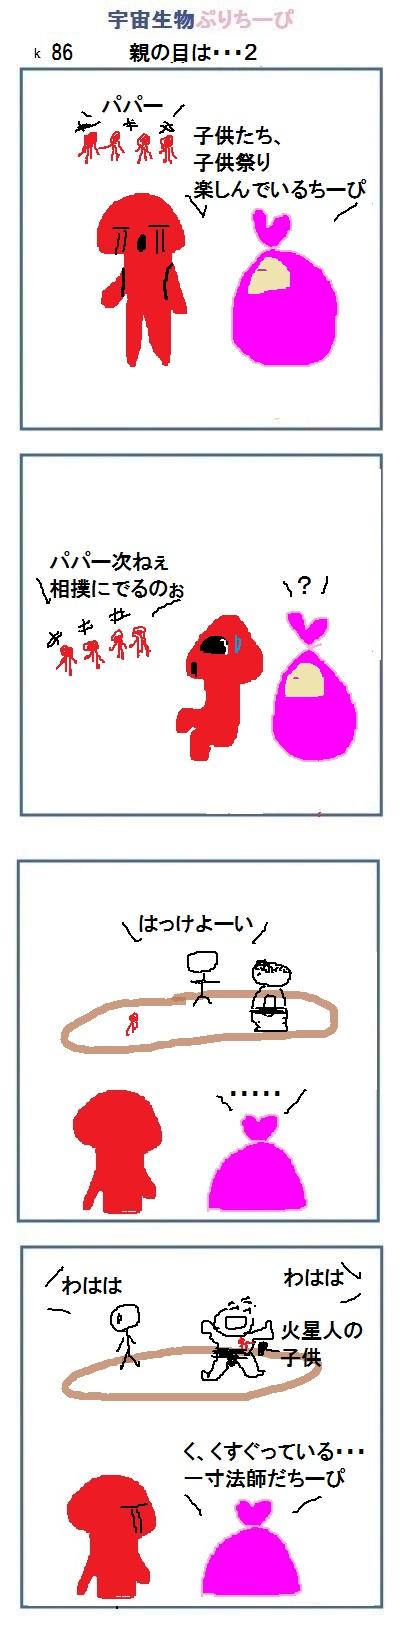 160830_k86.jpg